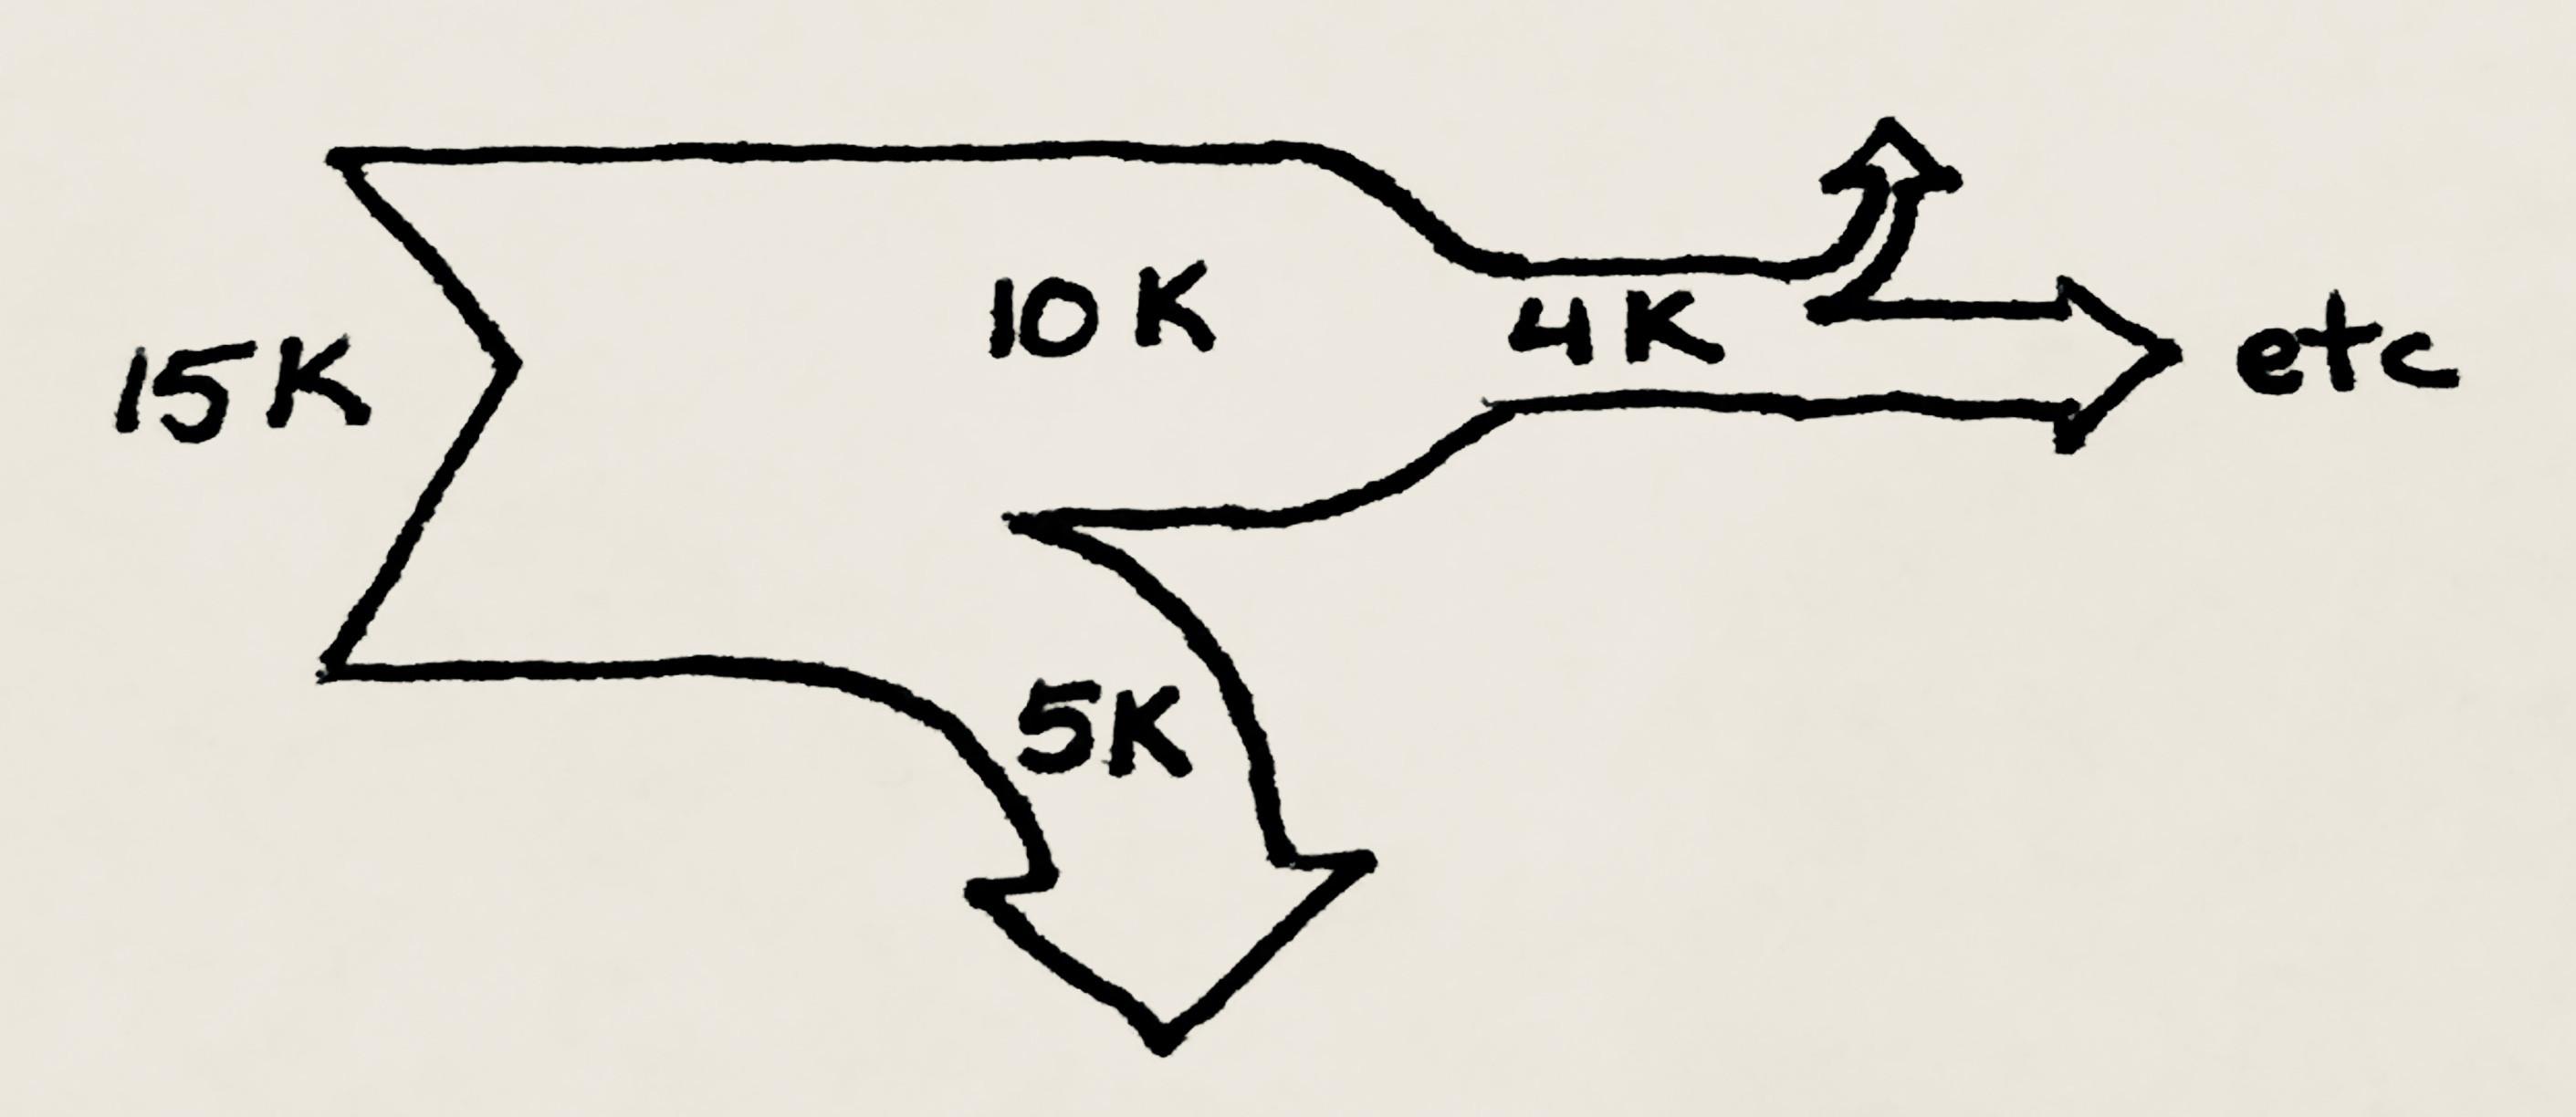 Sankey Like Diagram With Merging